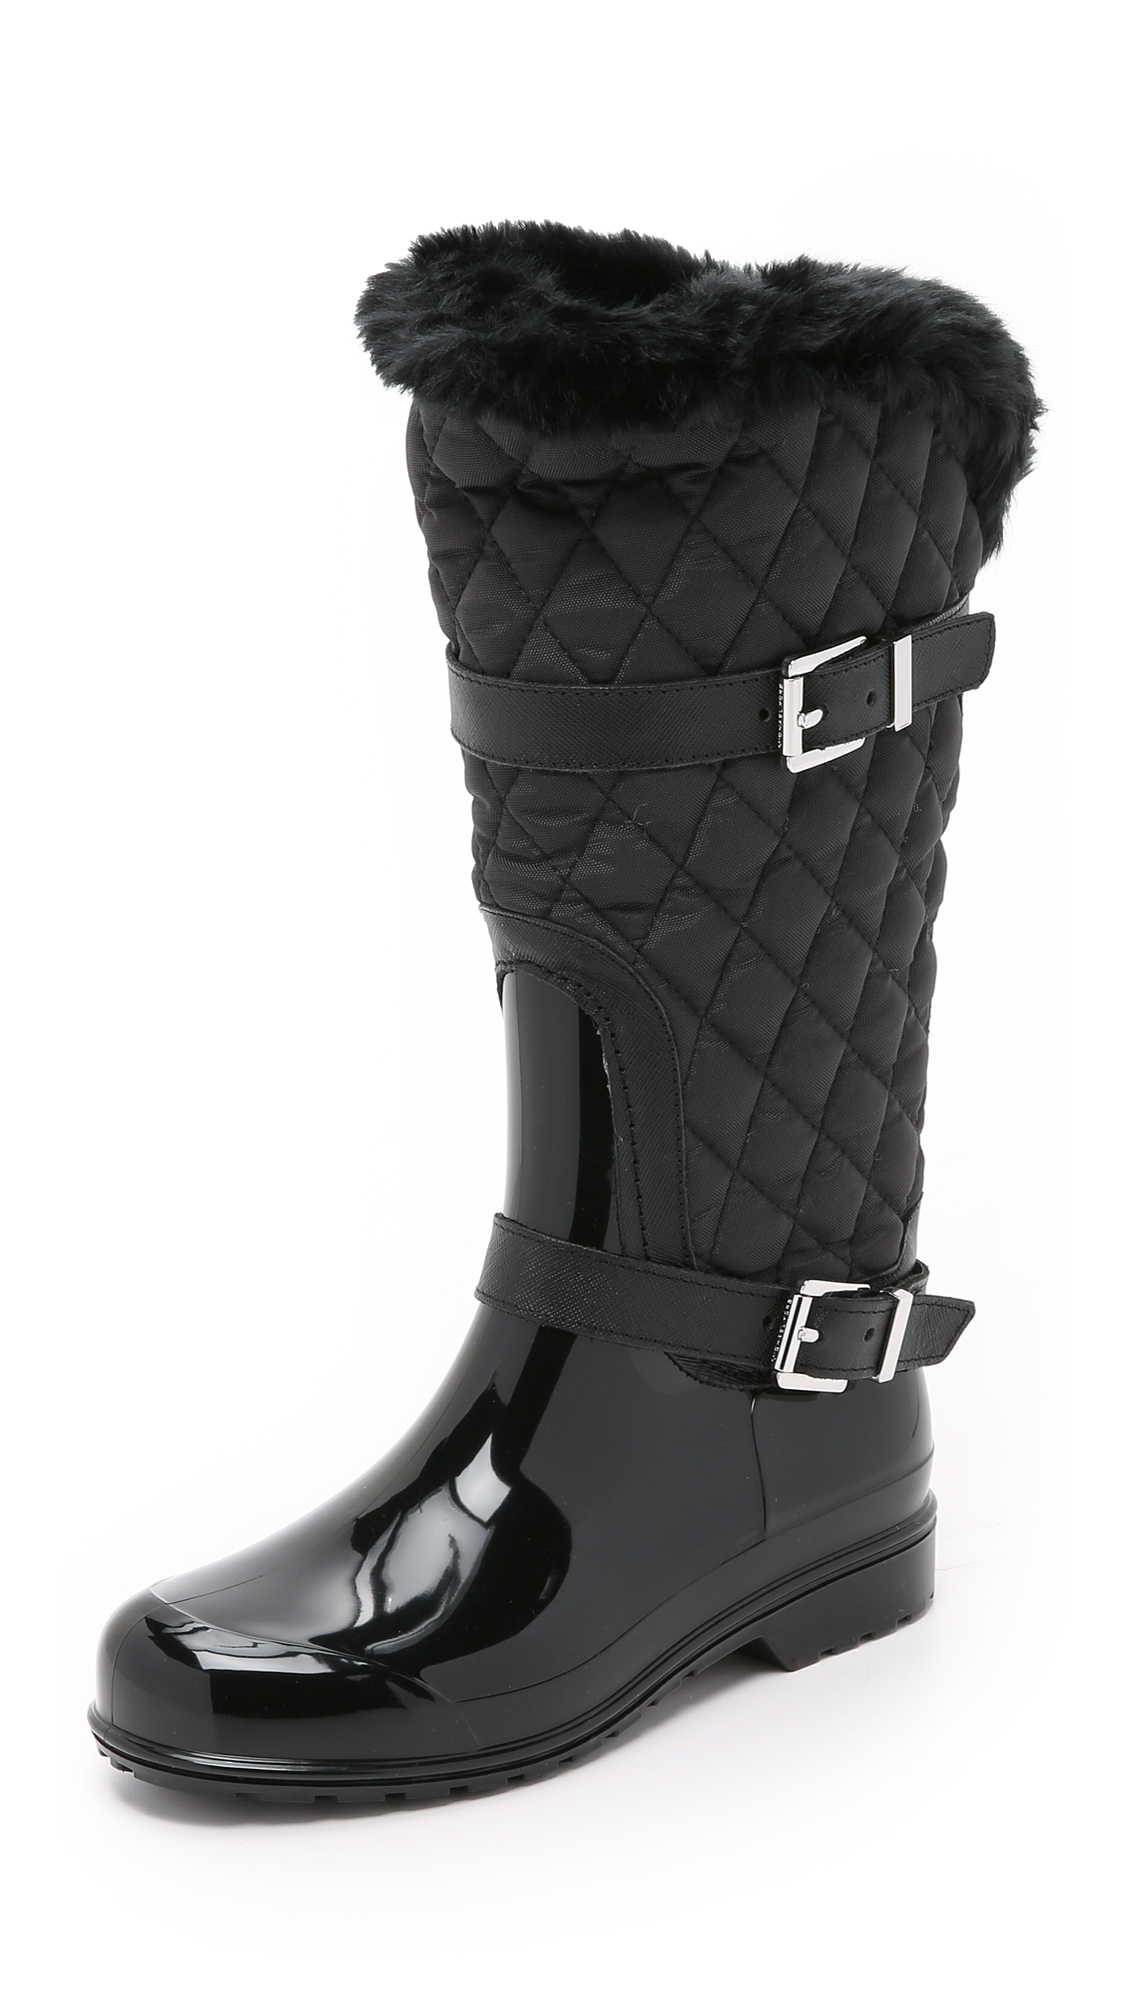 michael-michael-kors-black-fulton-quilted-mid-rain-boots-black-product-2-908400586-normal.jpeg